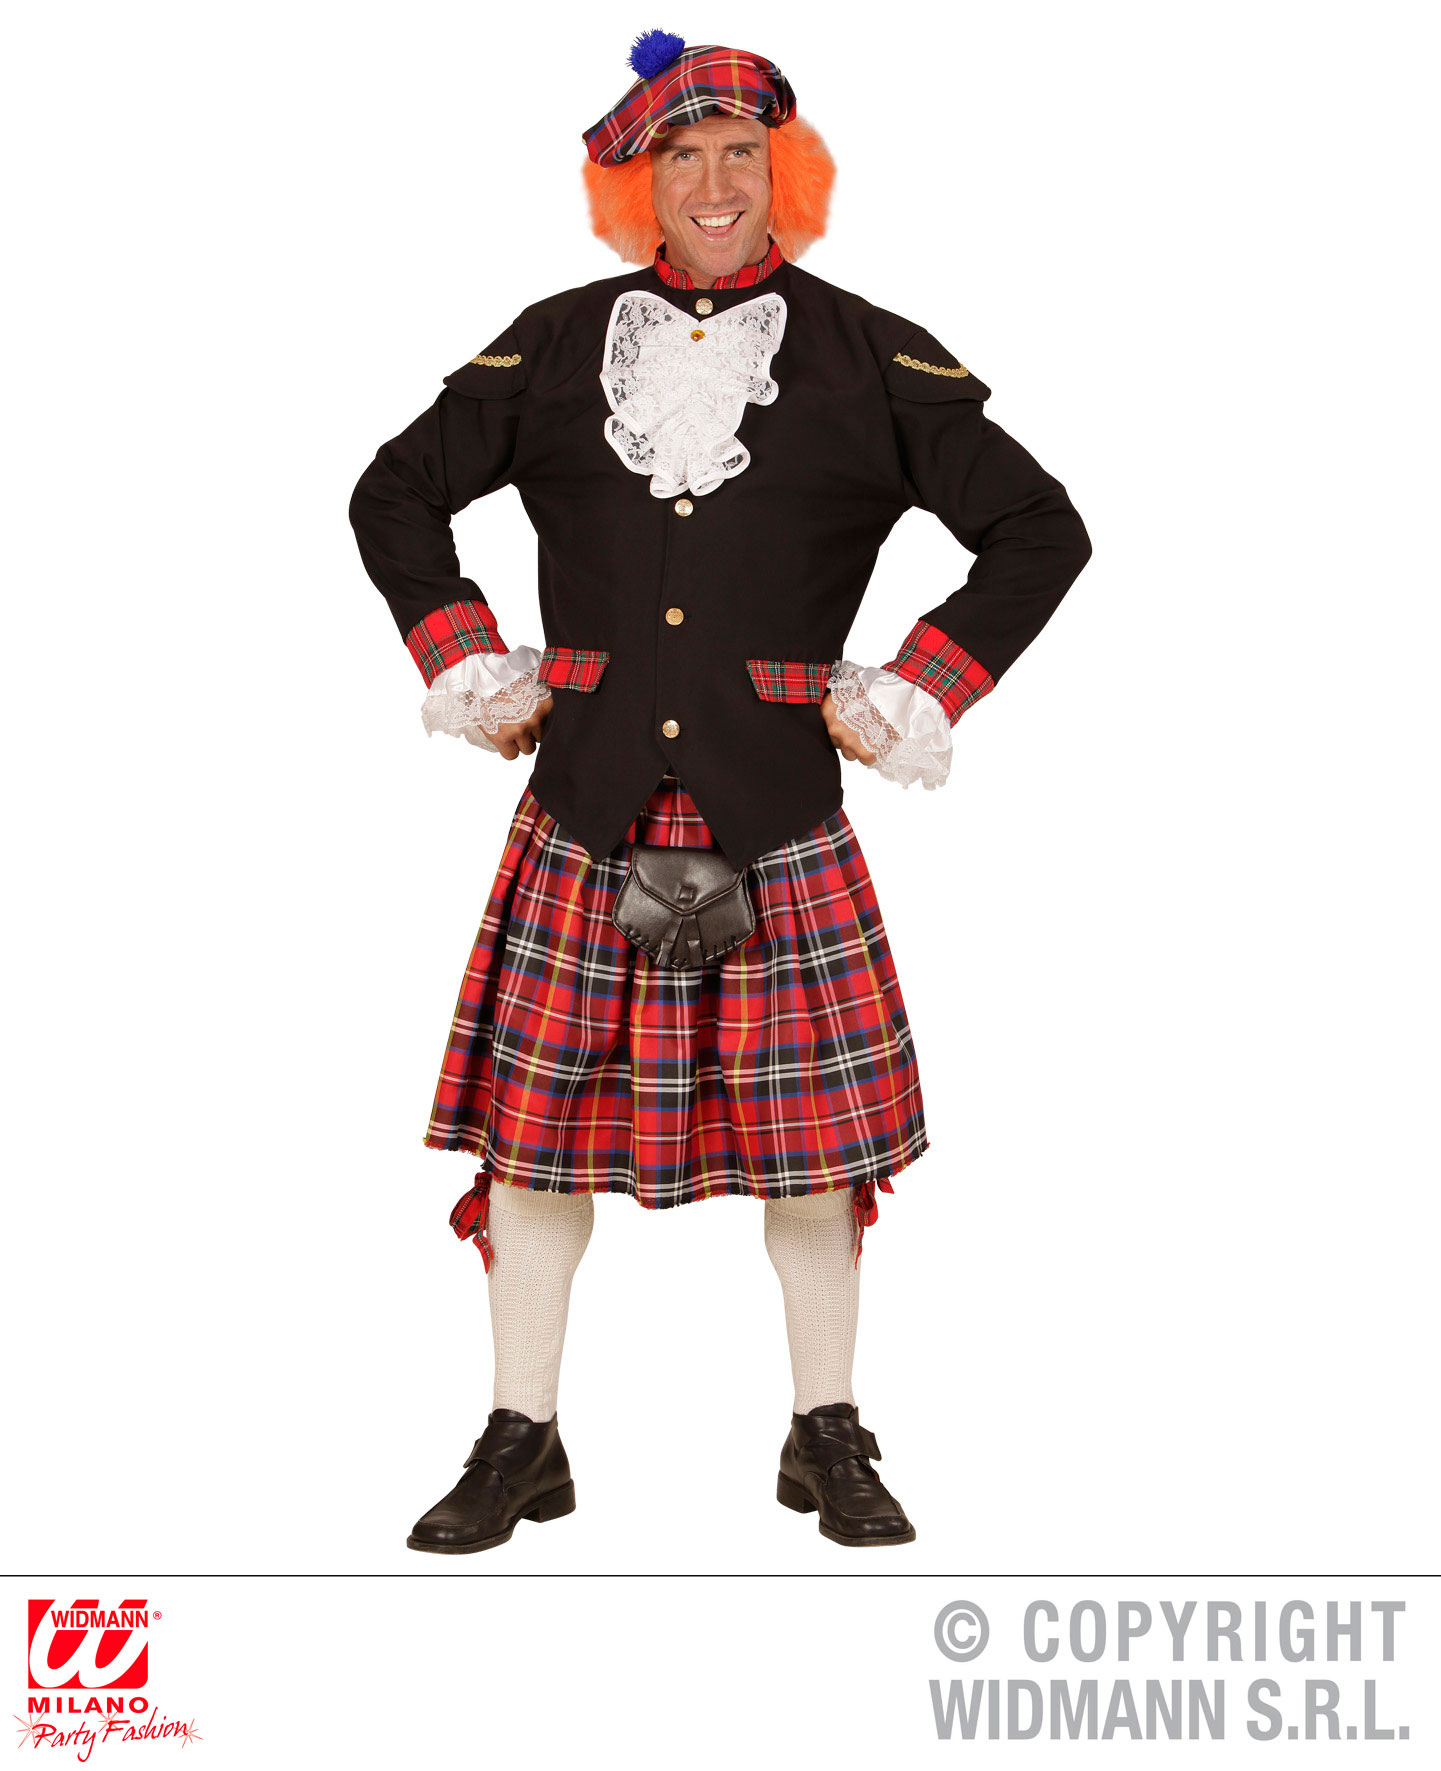 3 tlg. Kilt Kutte Schottenrock mit Kappe und Haar, Karneval Herren